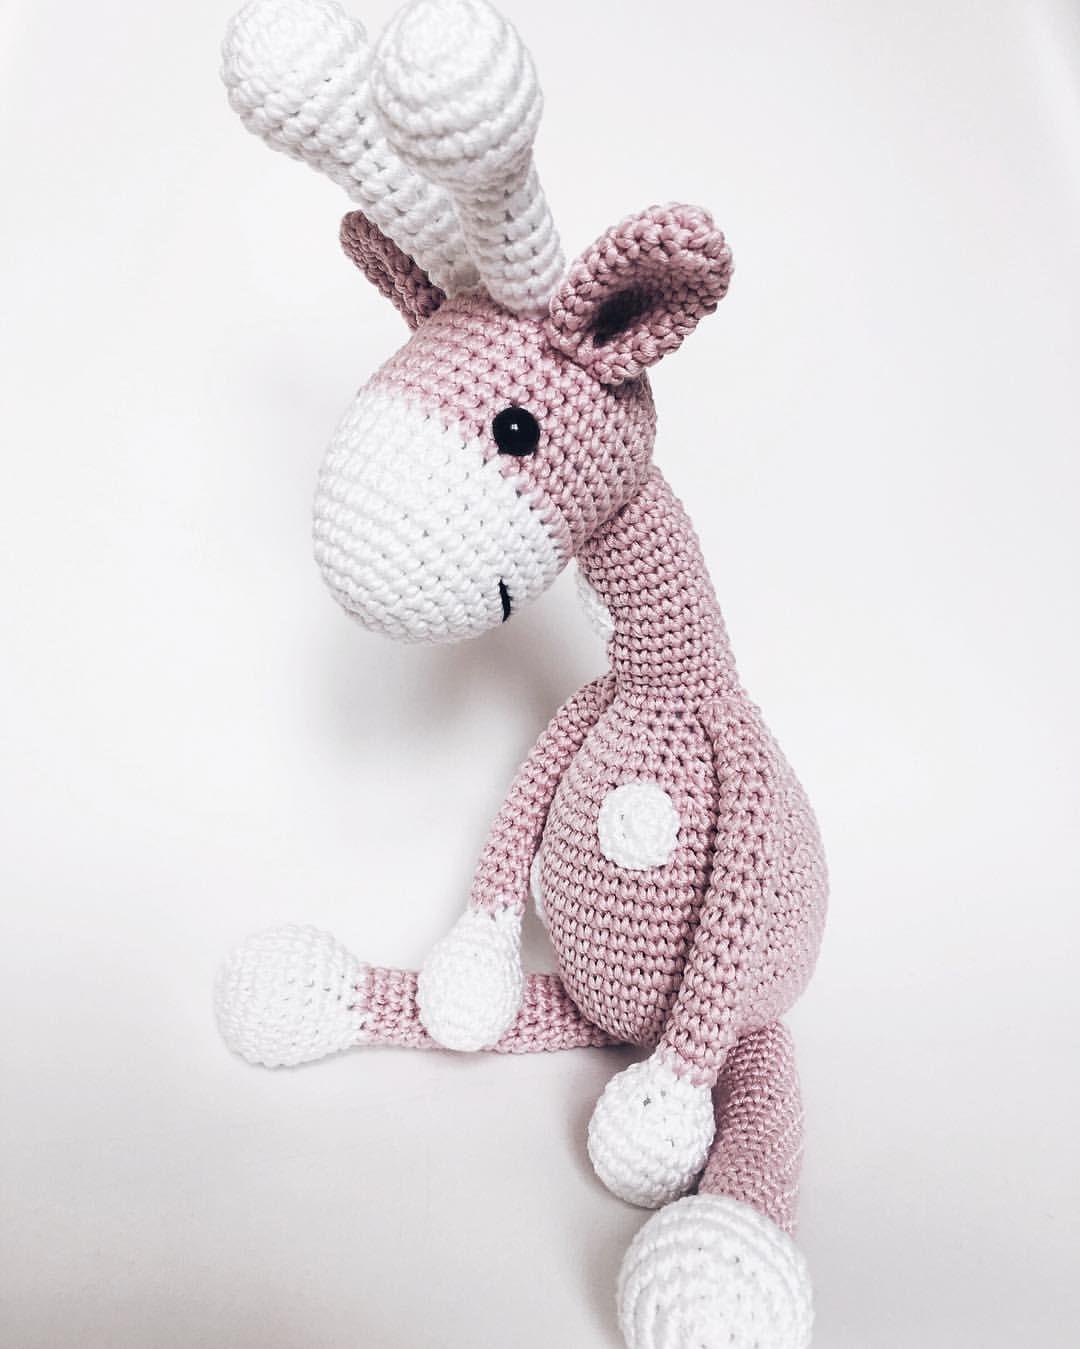 Crochet giraffe in baby pink by Katiu | crochet toys | Pinterest